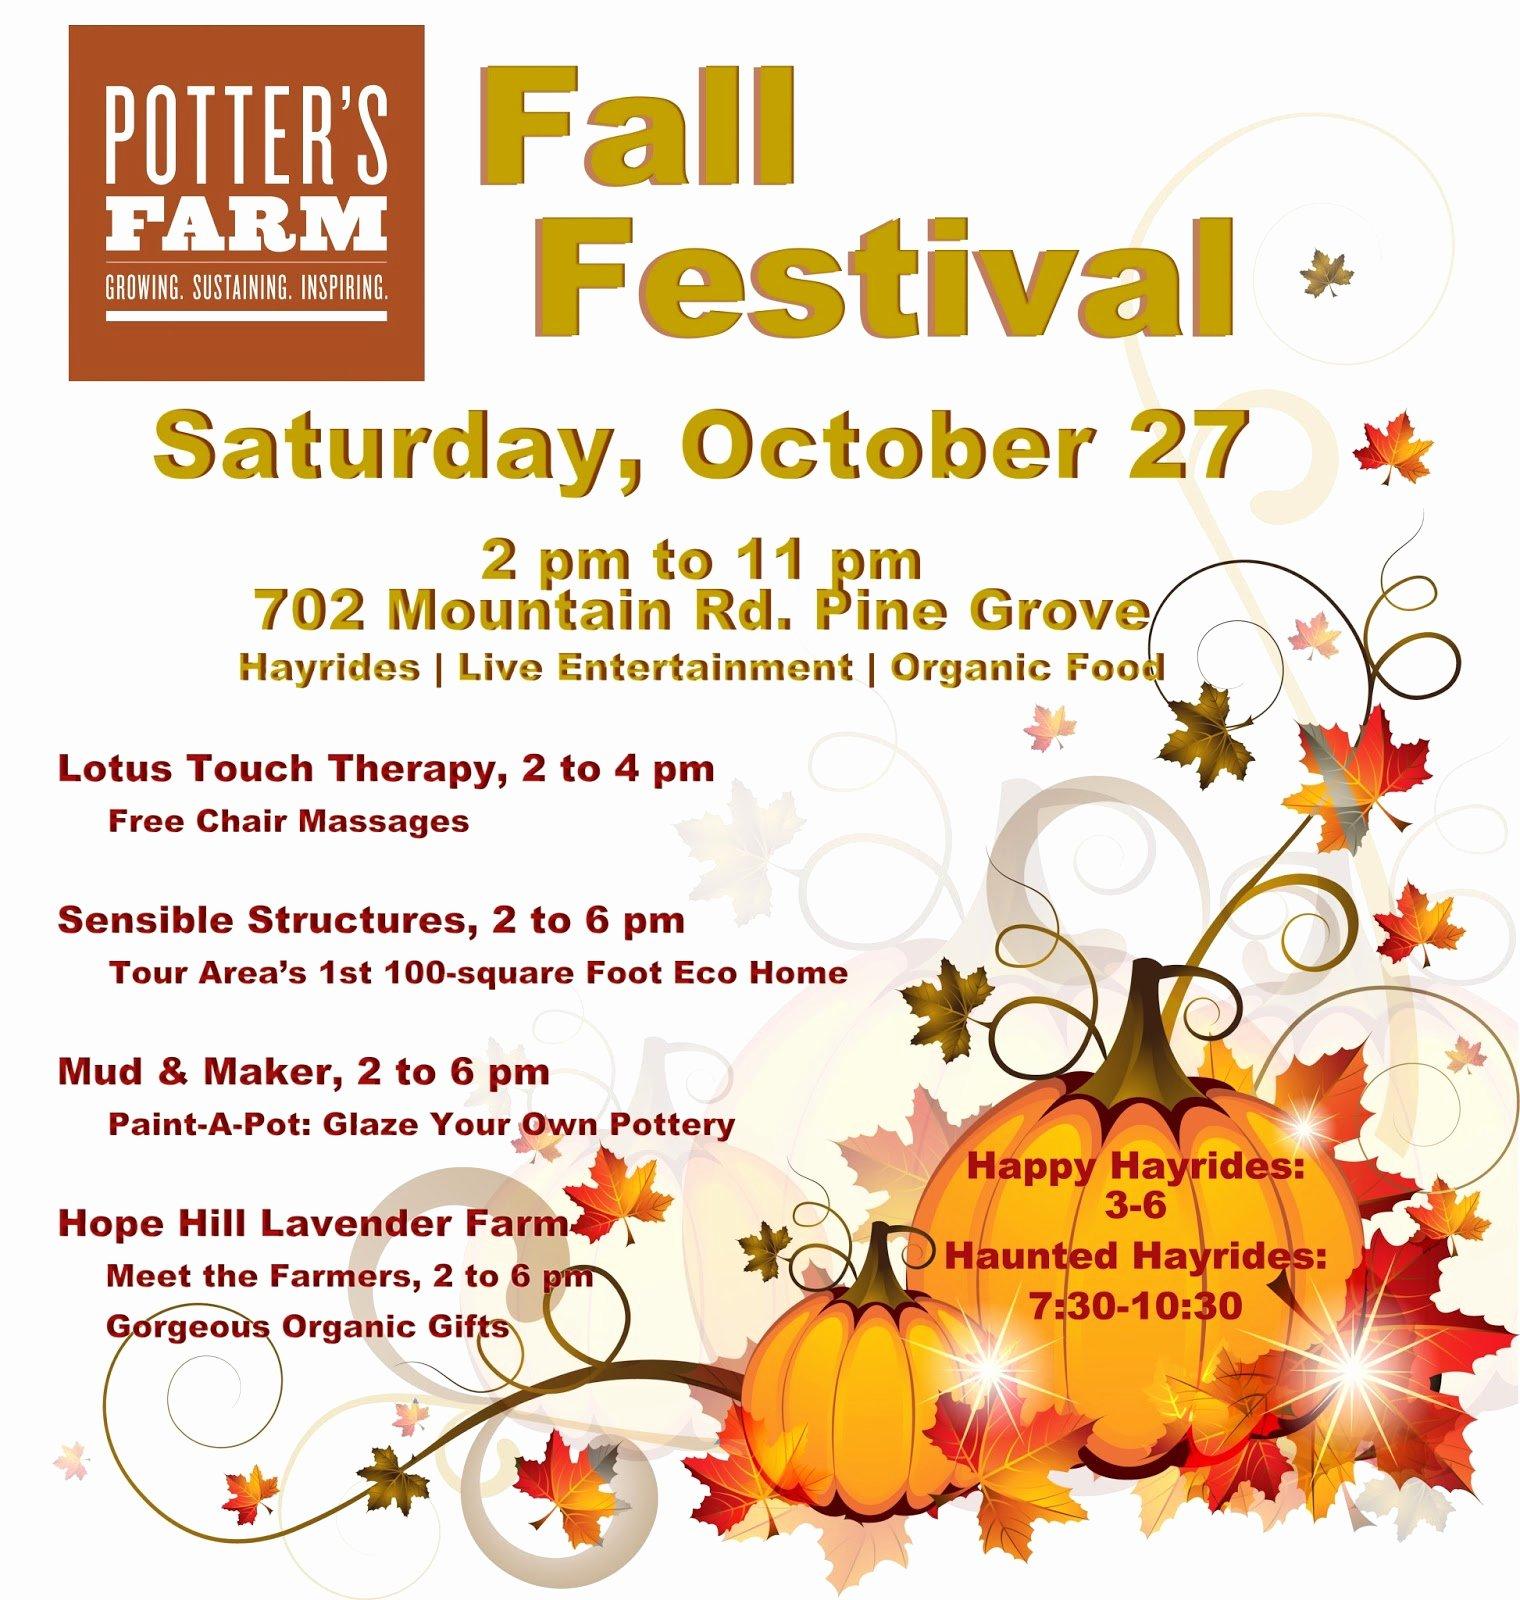 Fall Fest Flyer Template Beautiful 19 Free Fall Festival Flyer Template Psd Fall